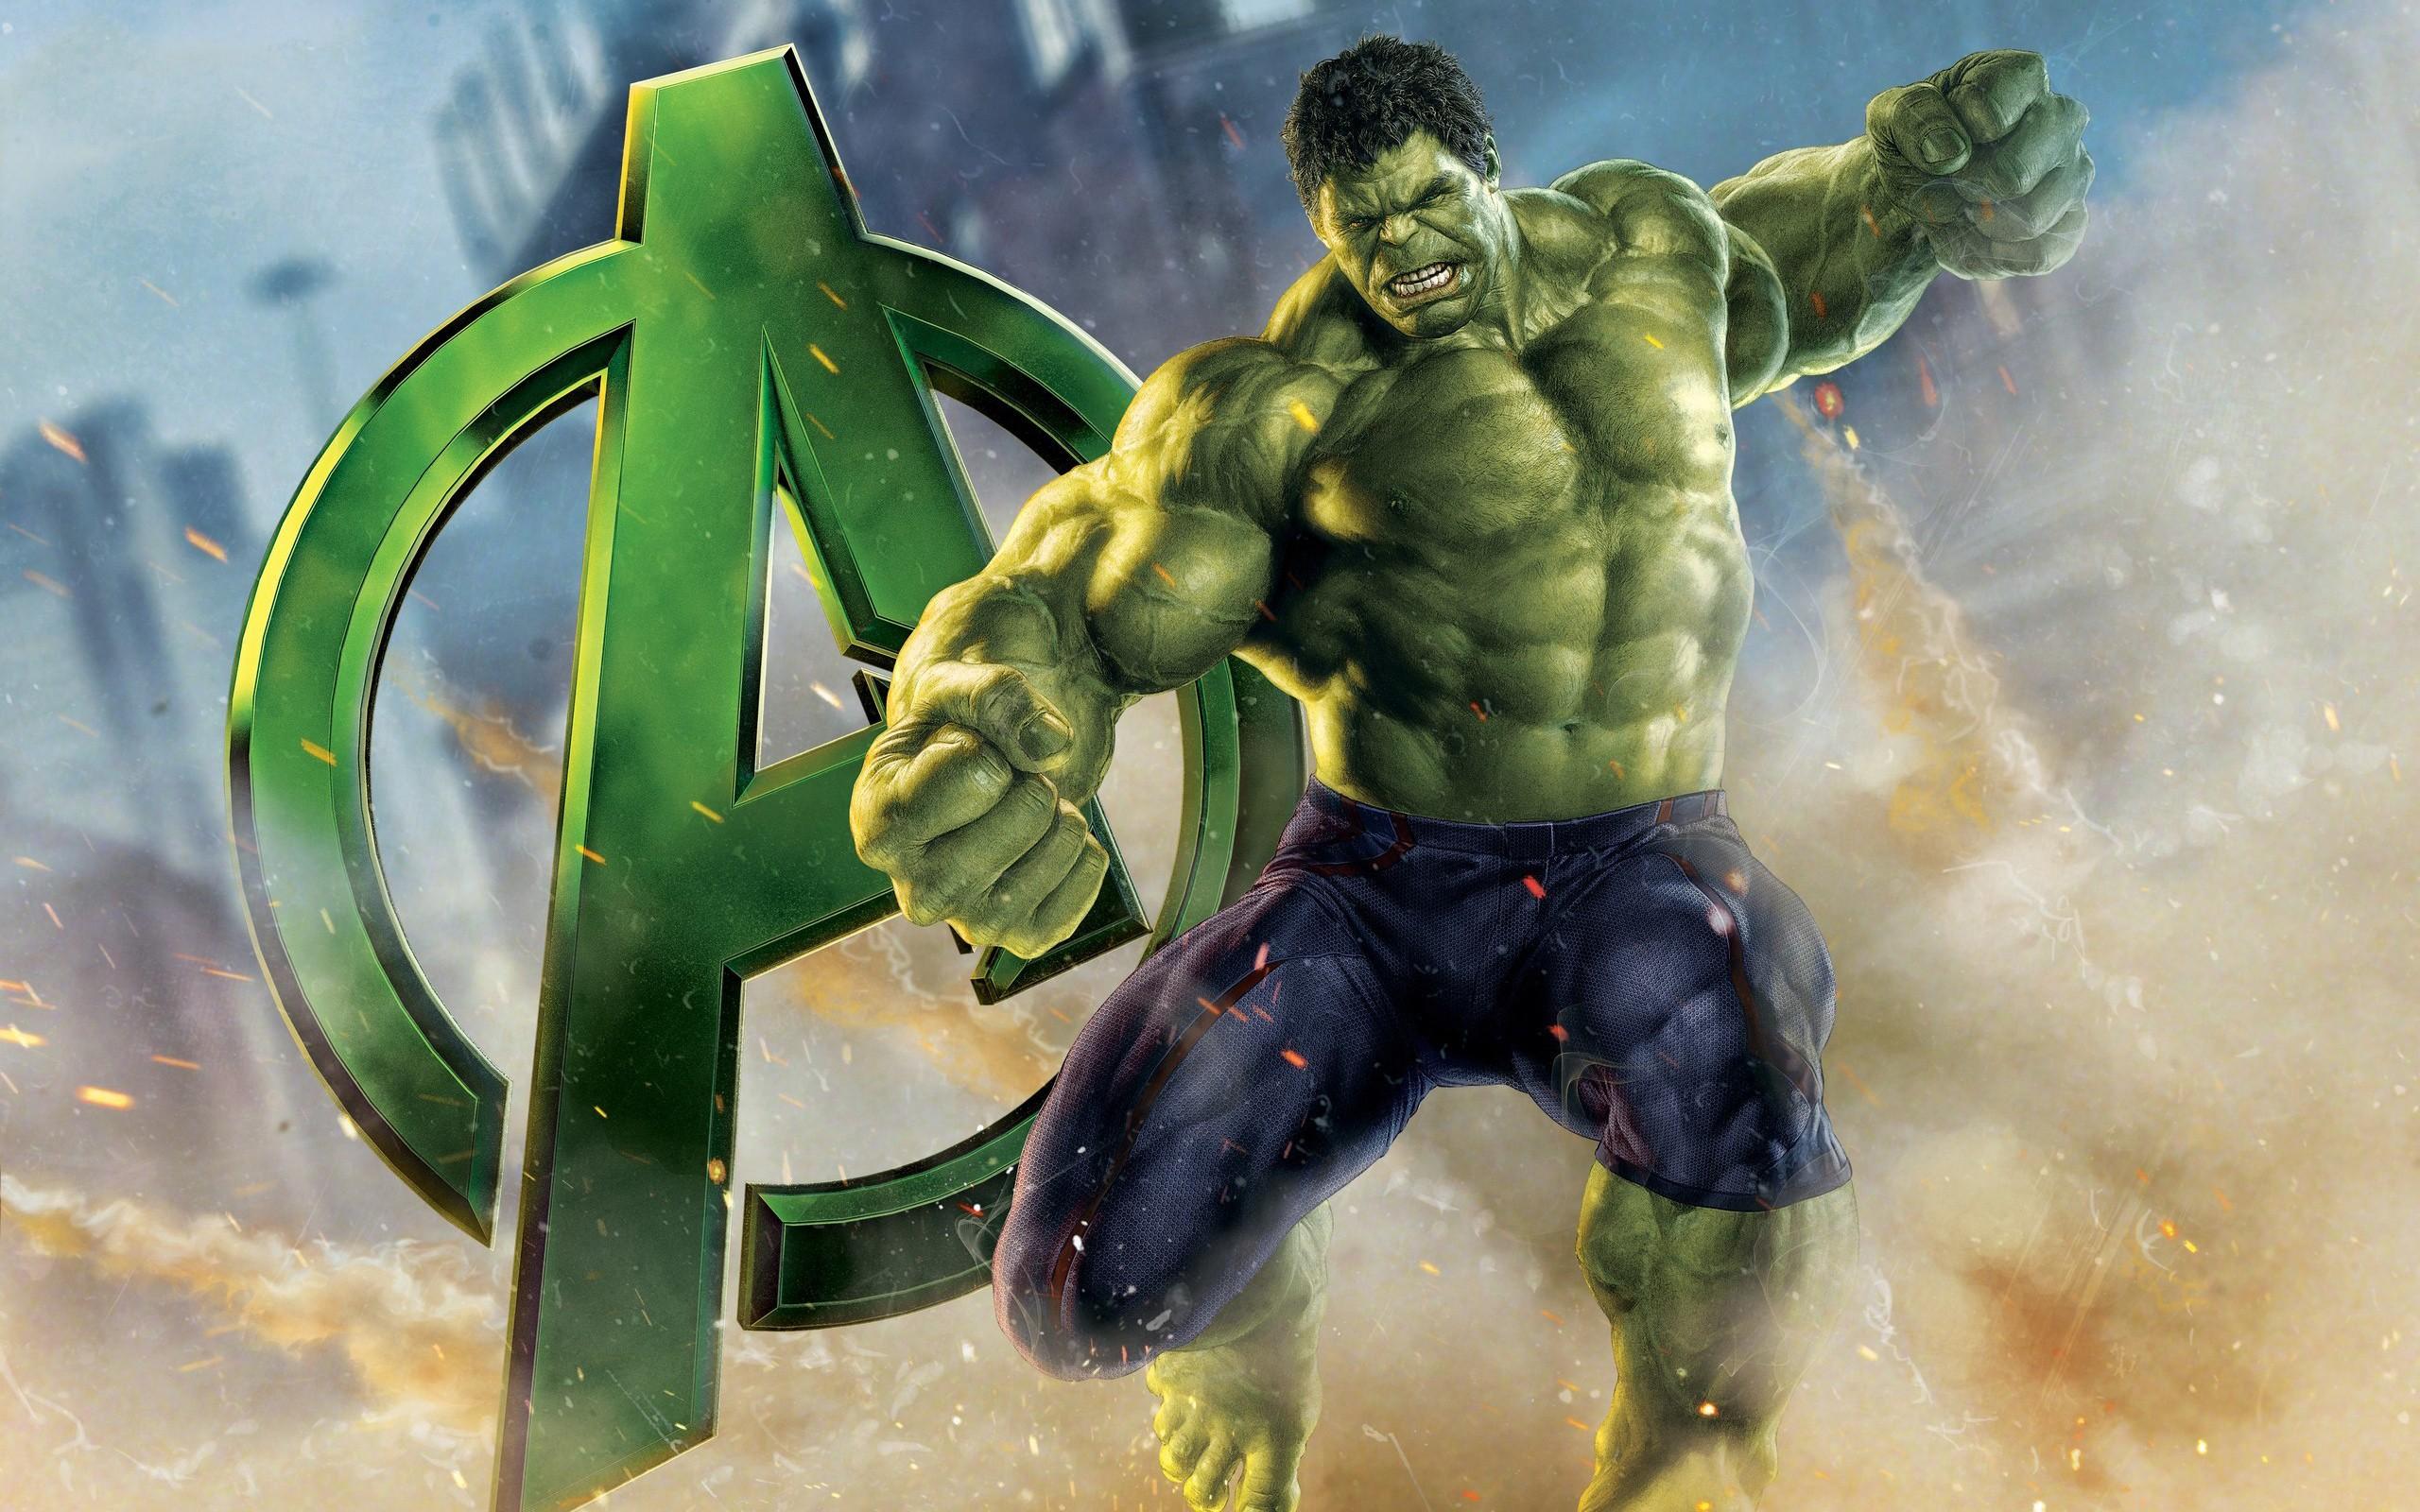 Avengers Hulk Movie   New HD Wallpapers 2560x1600